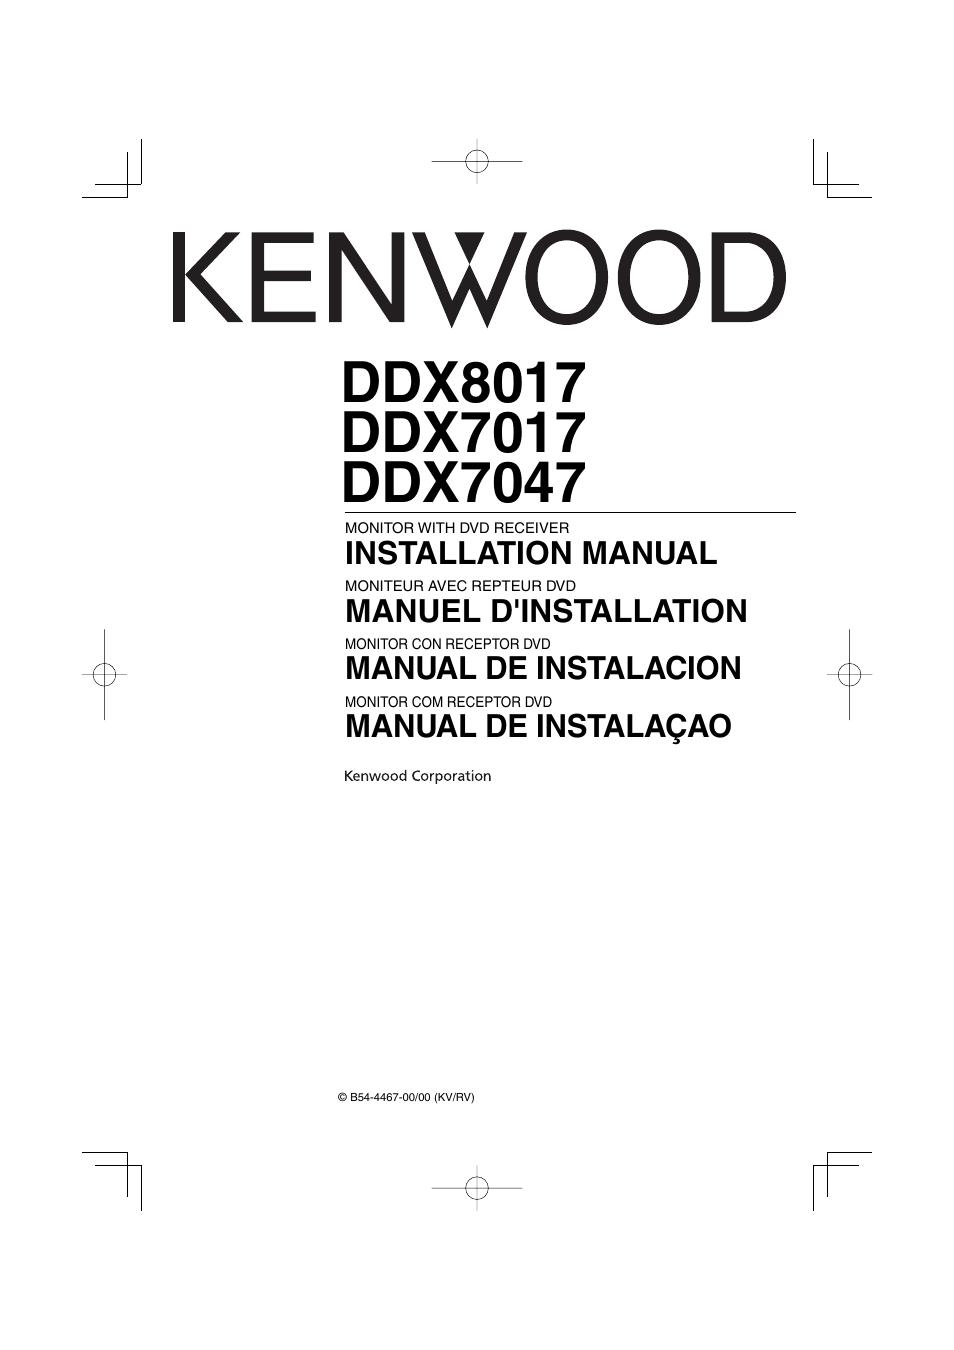 kenwood ddx7017 user manual 44 pages also for ddx7047 rh manualsdir com Kenwood DDX419 Kenwood DDX419